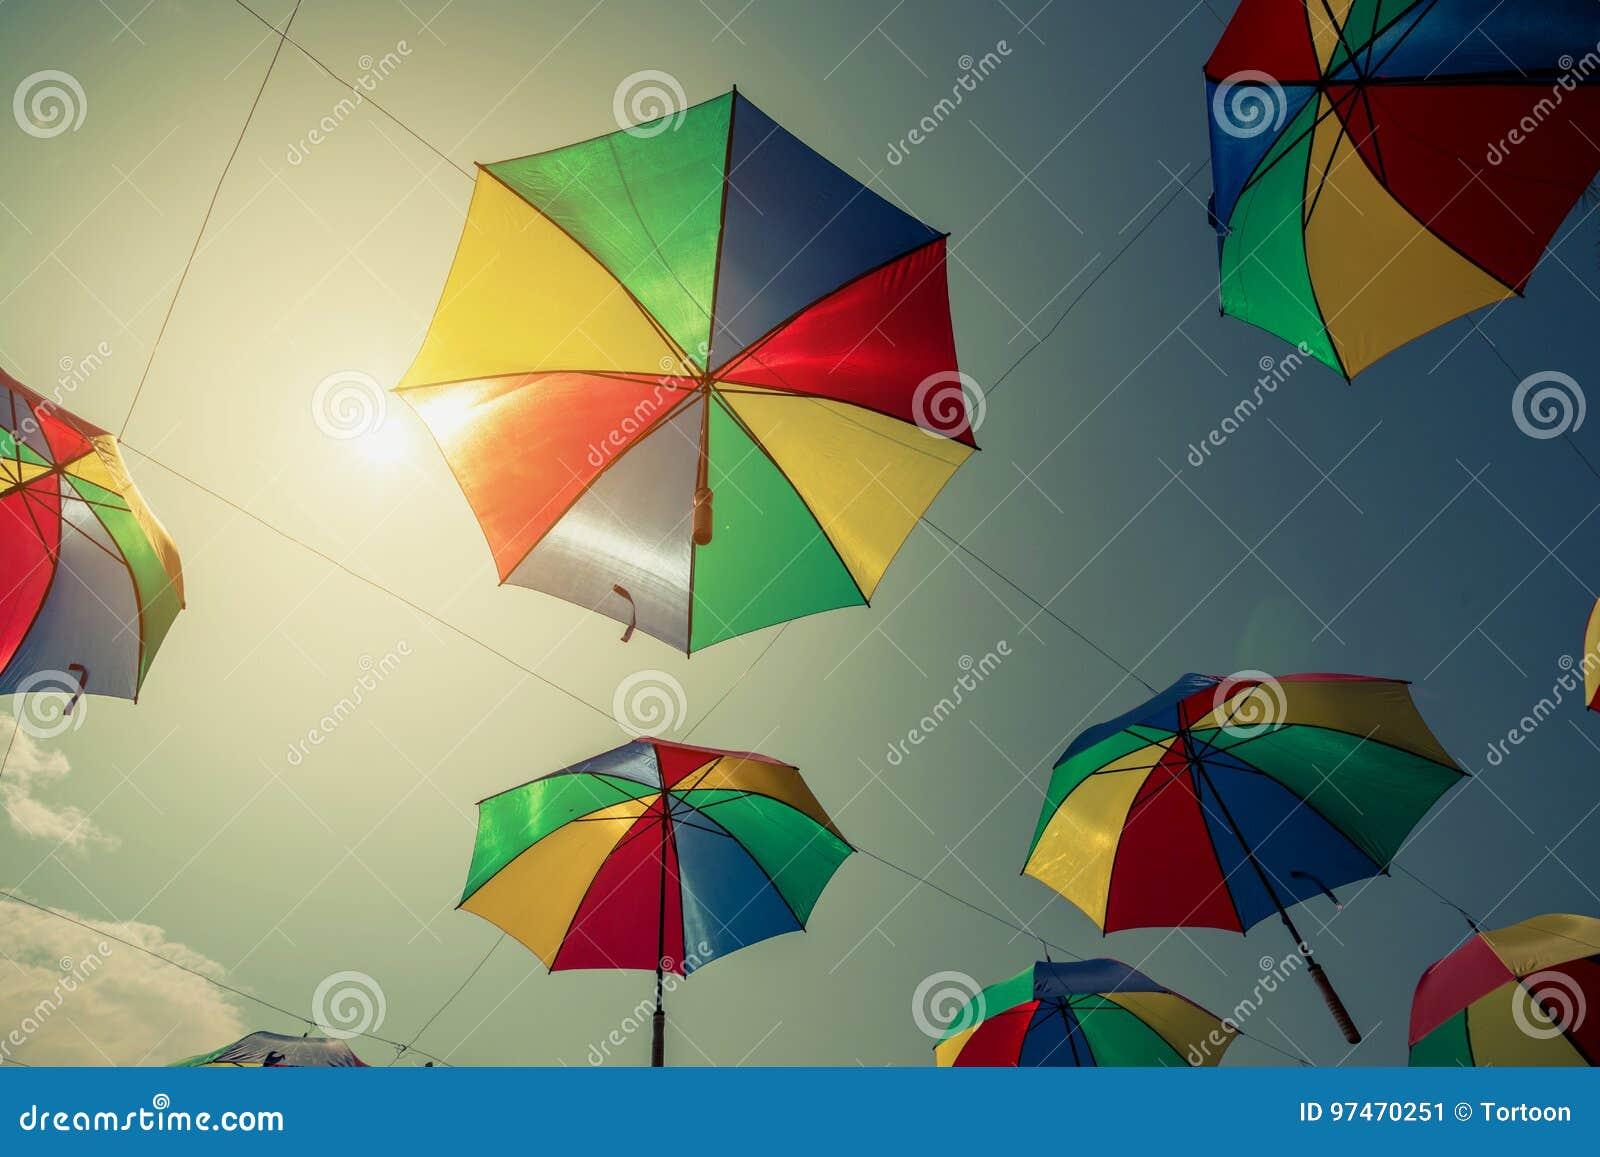 Colorful Umbrella Street Decoration With Sunlight. Vintage Tone ...